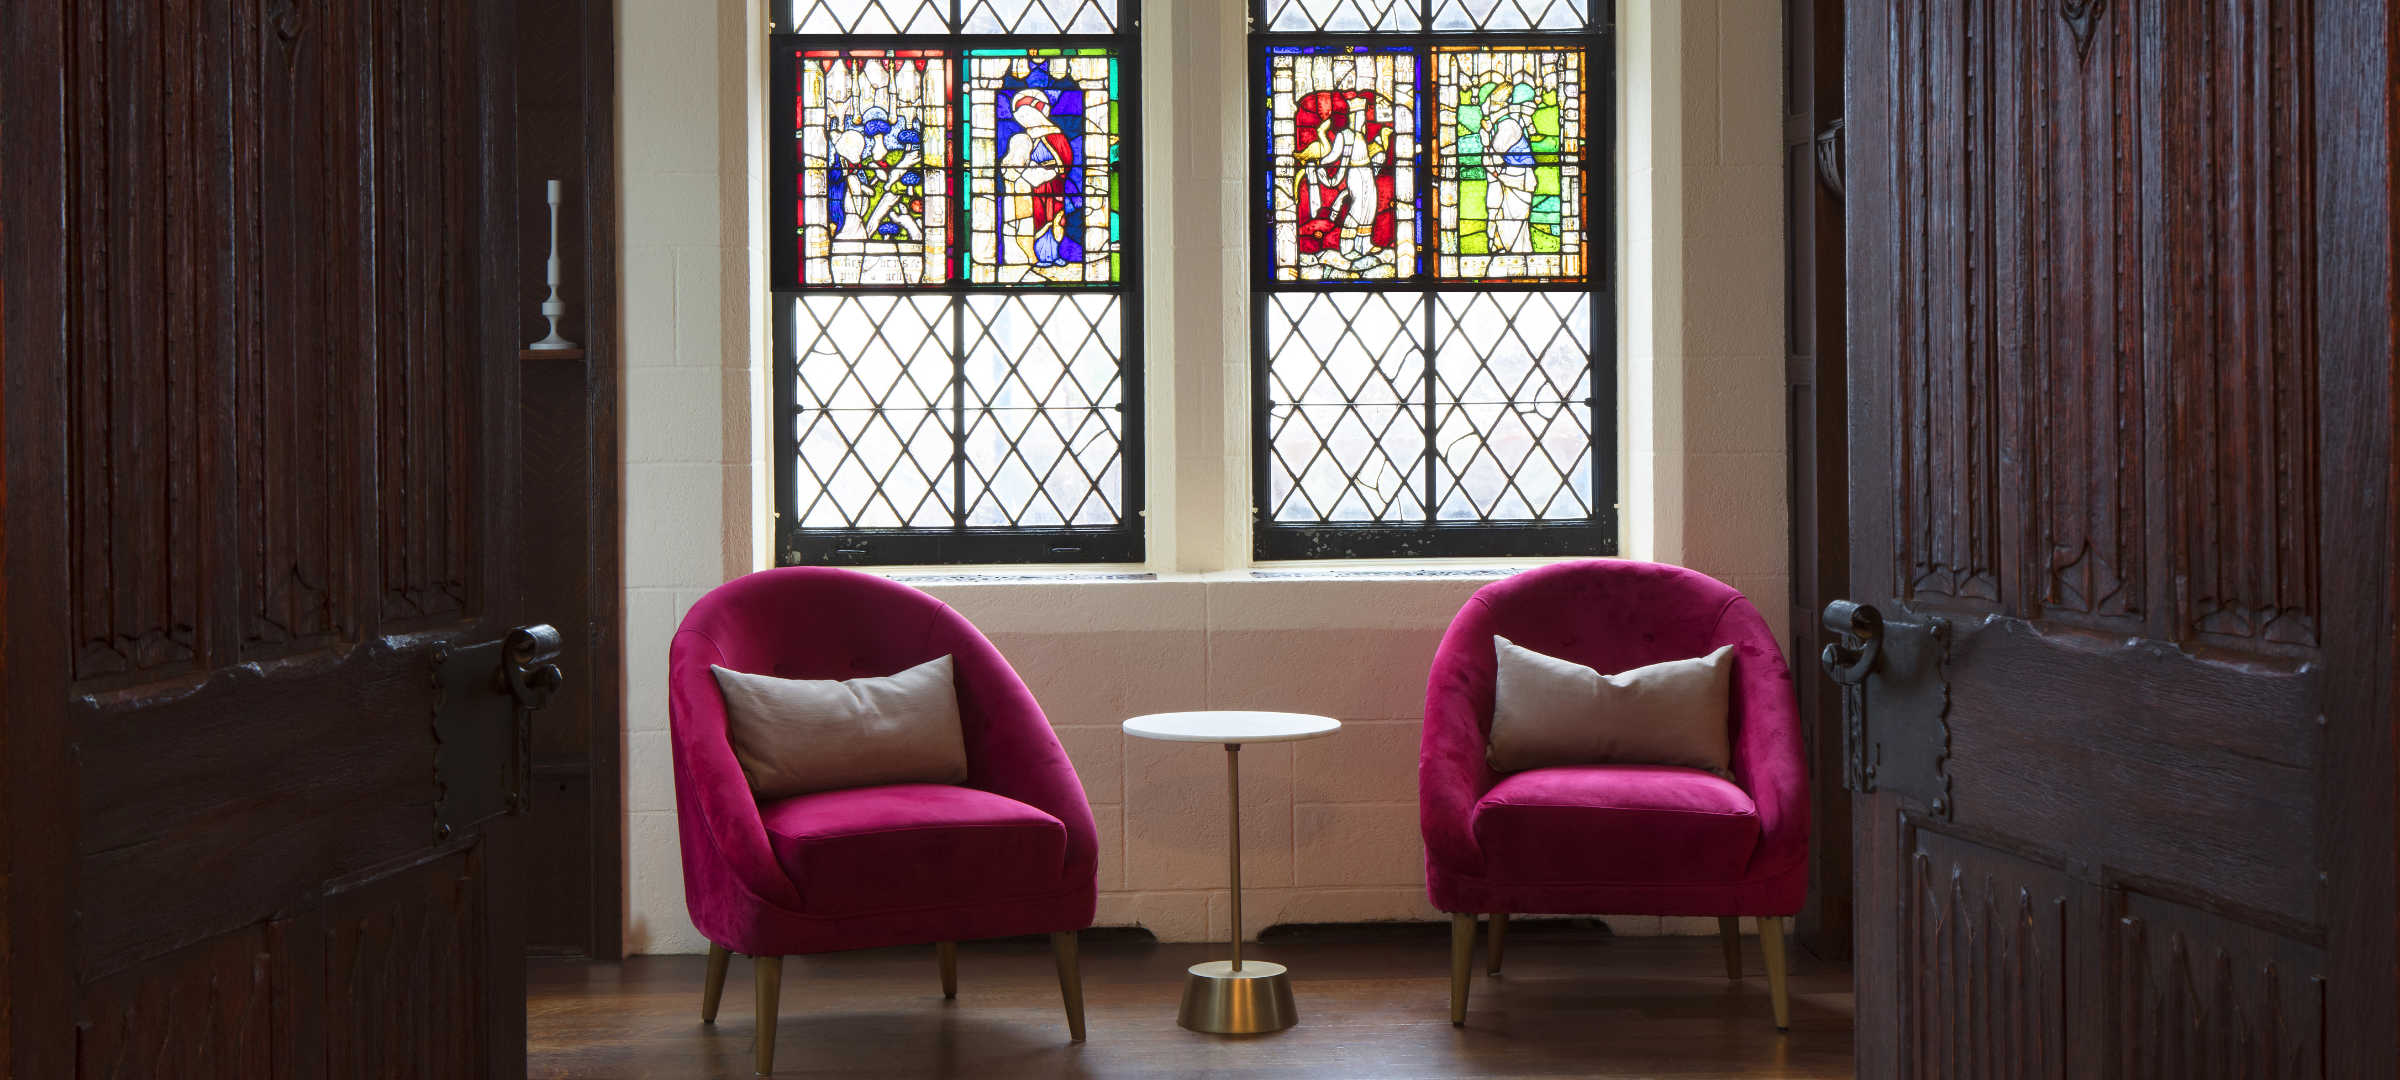 SBSG Interior Design Living Room 91 Central Park West, NY